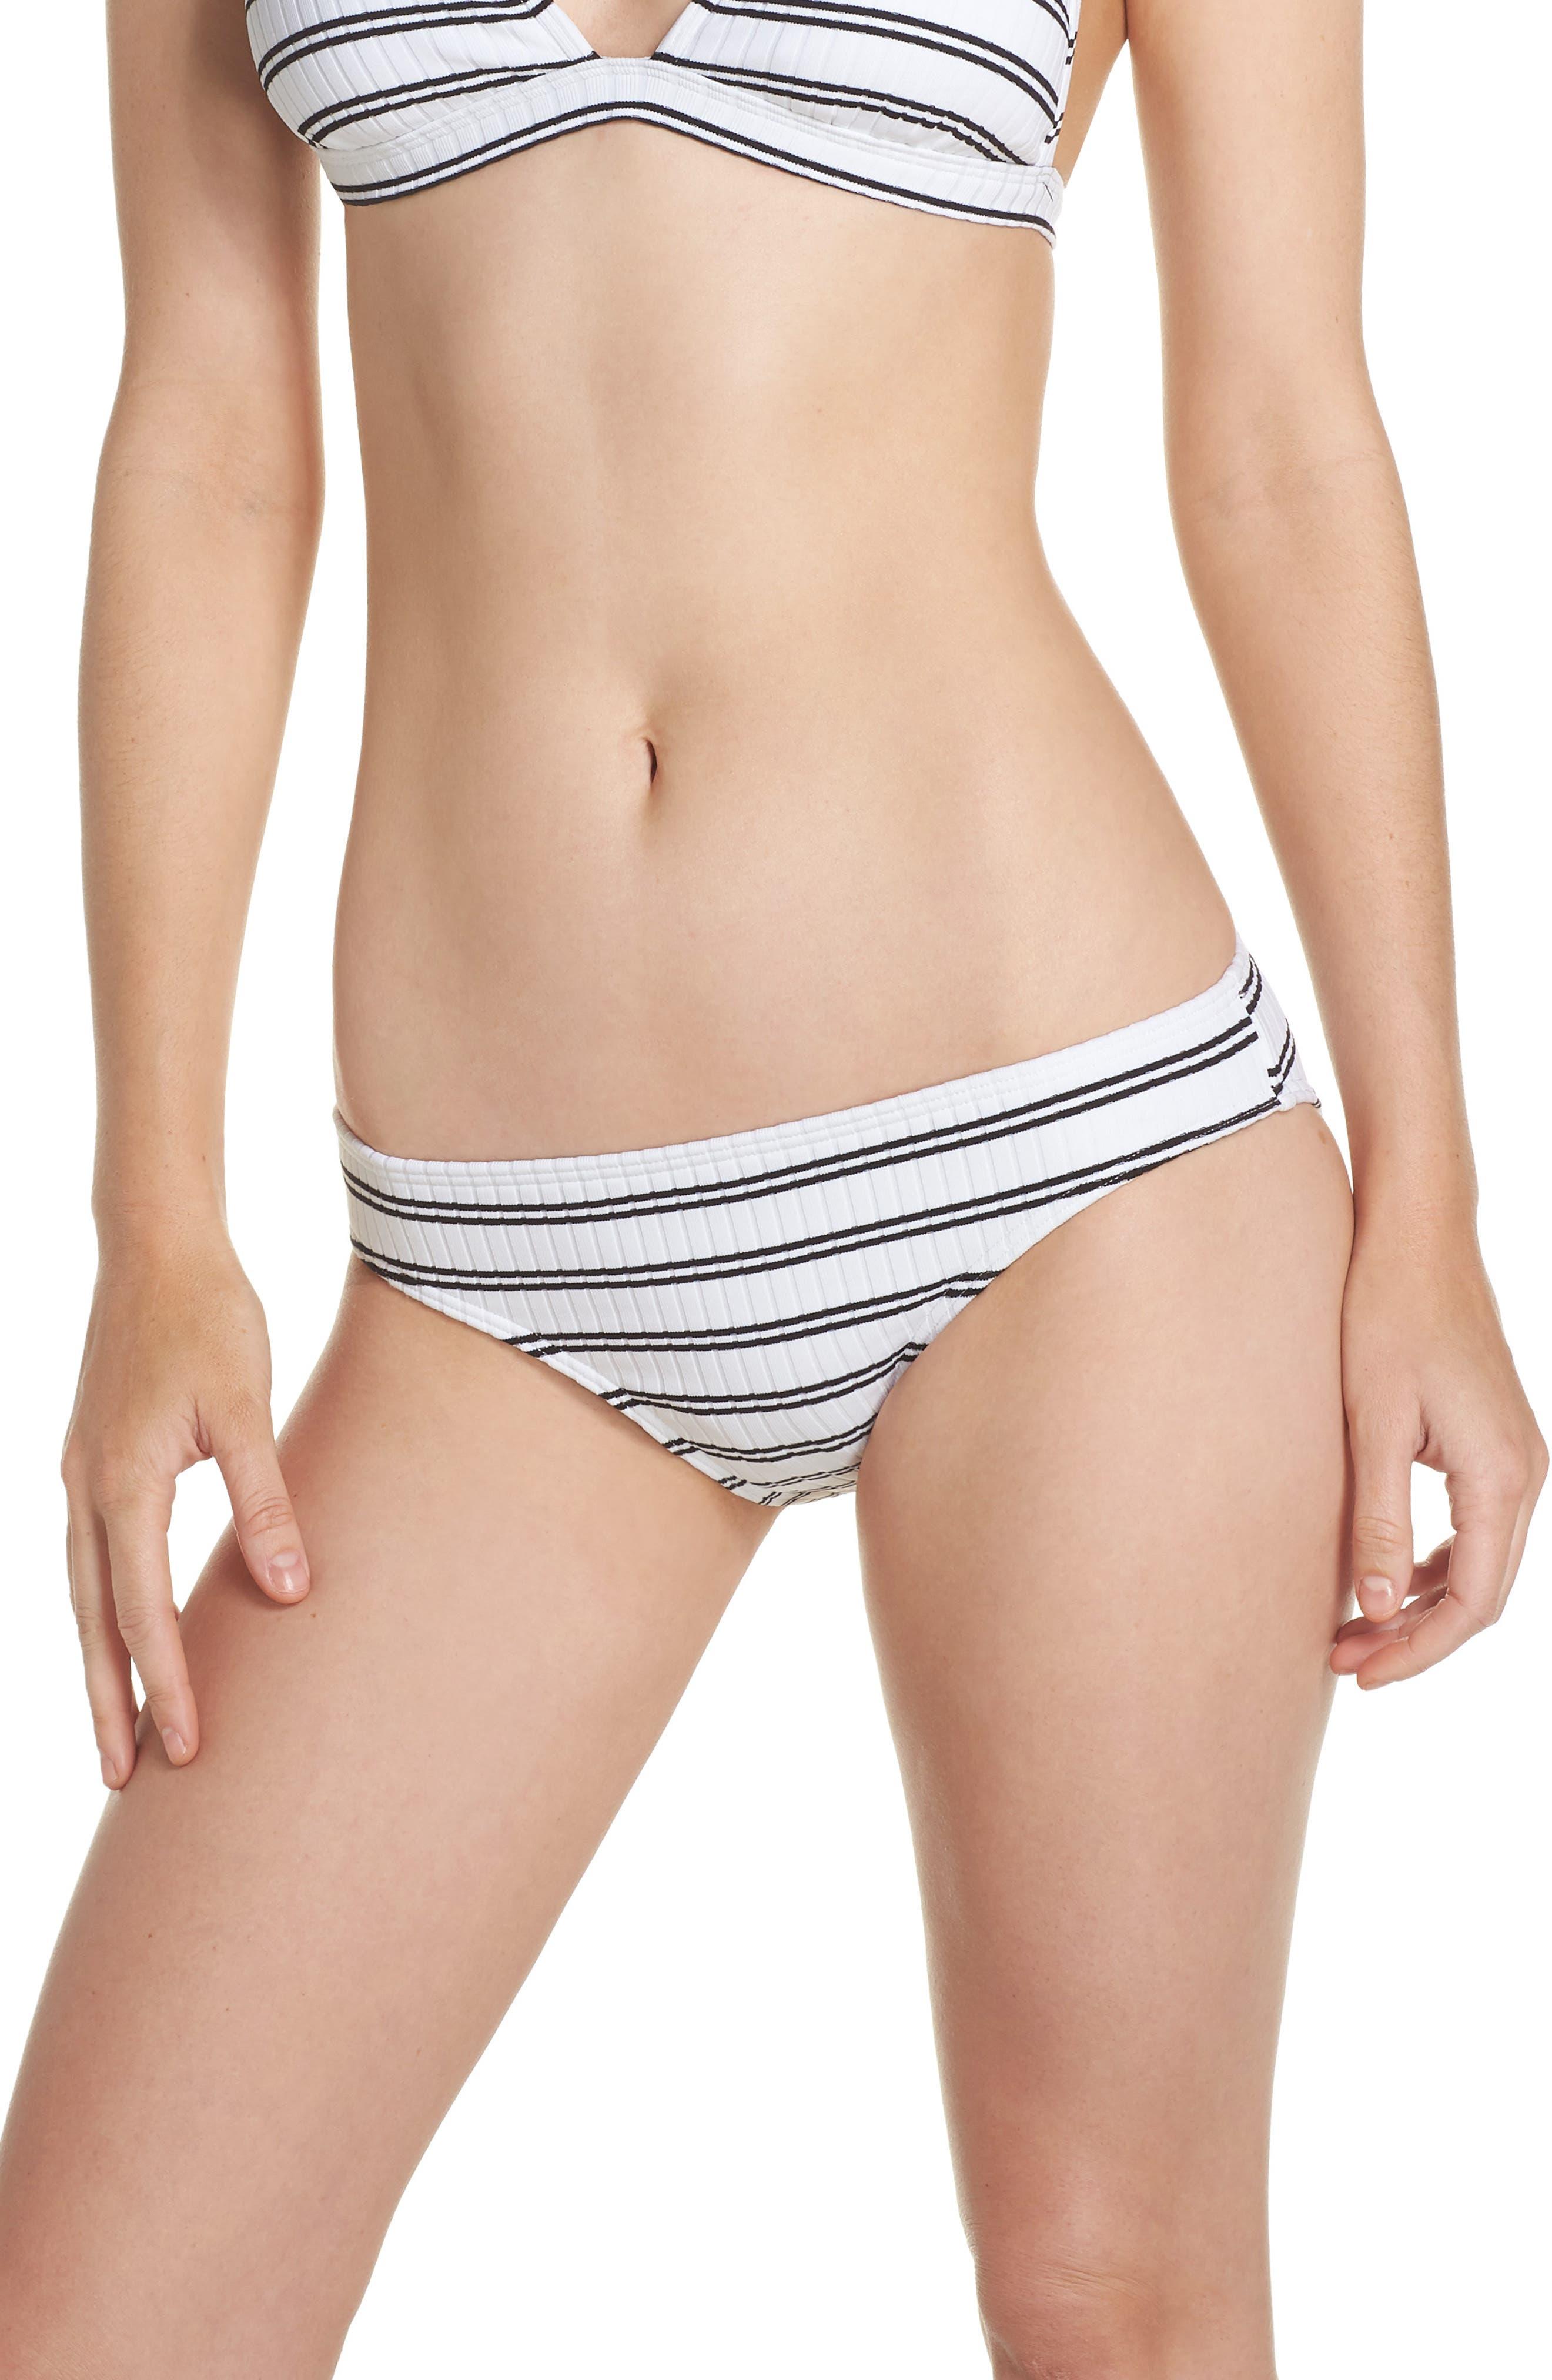 Inka Striped Hipster Bikini Bottoms,                             Main thumbnail 1, color,                             White